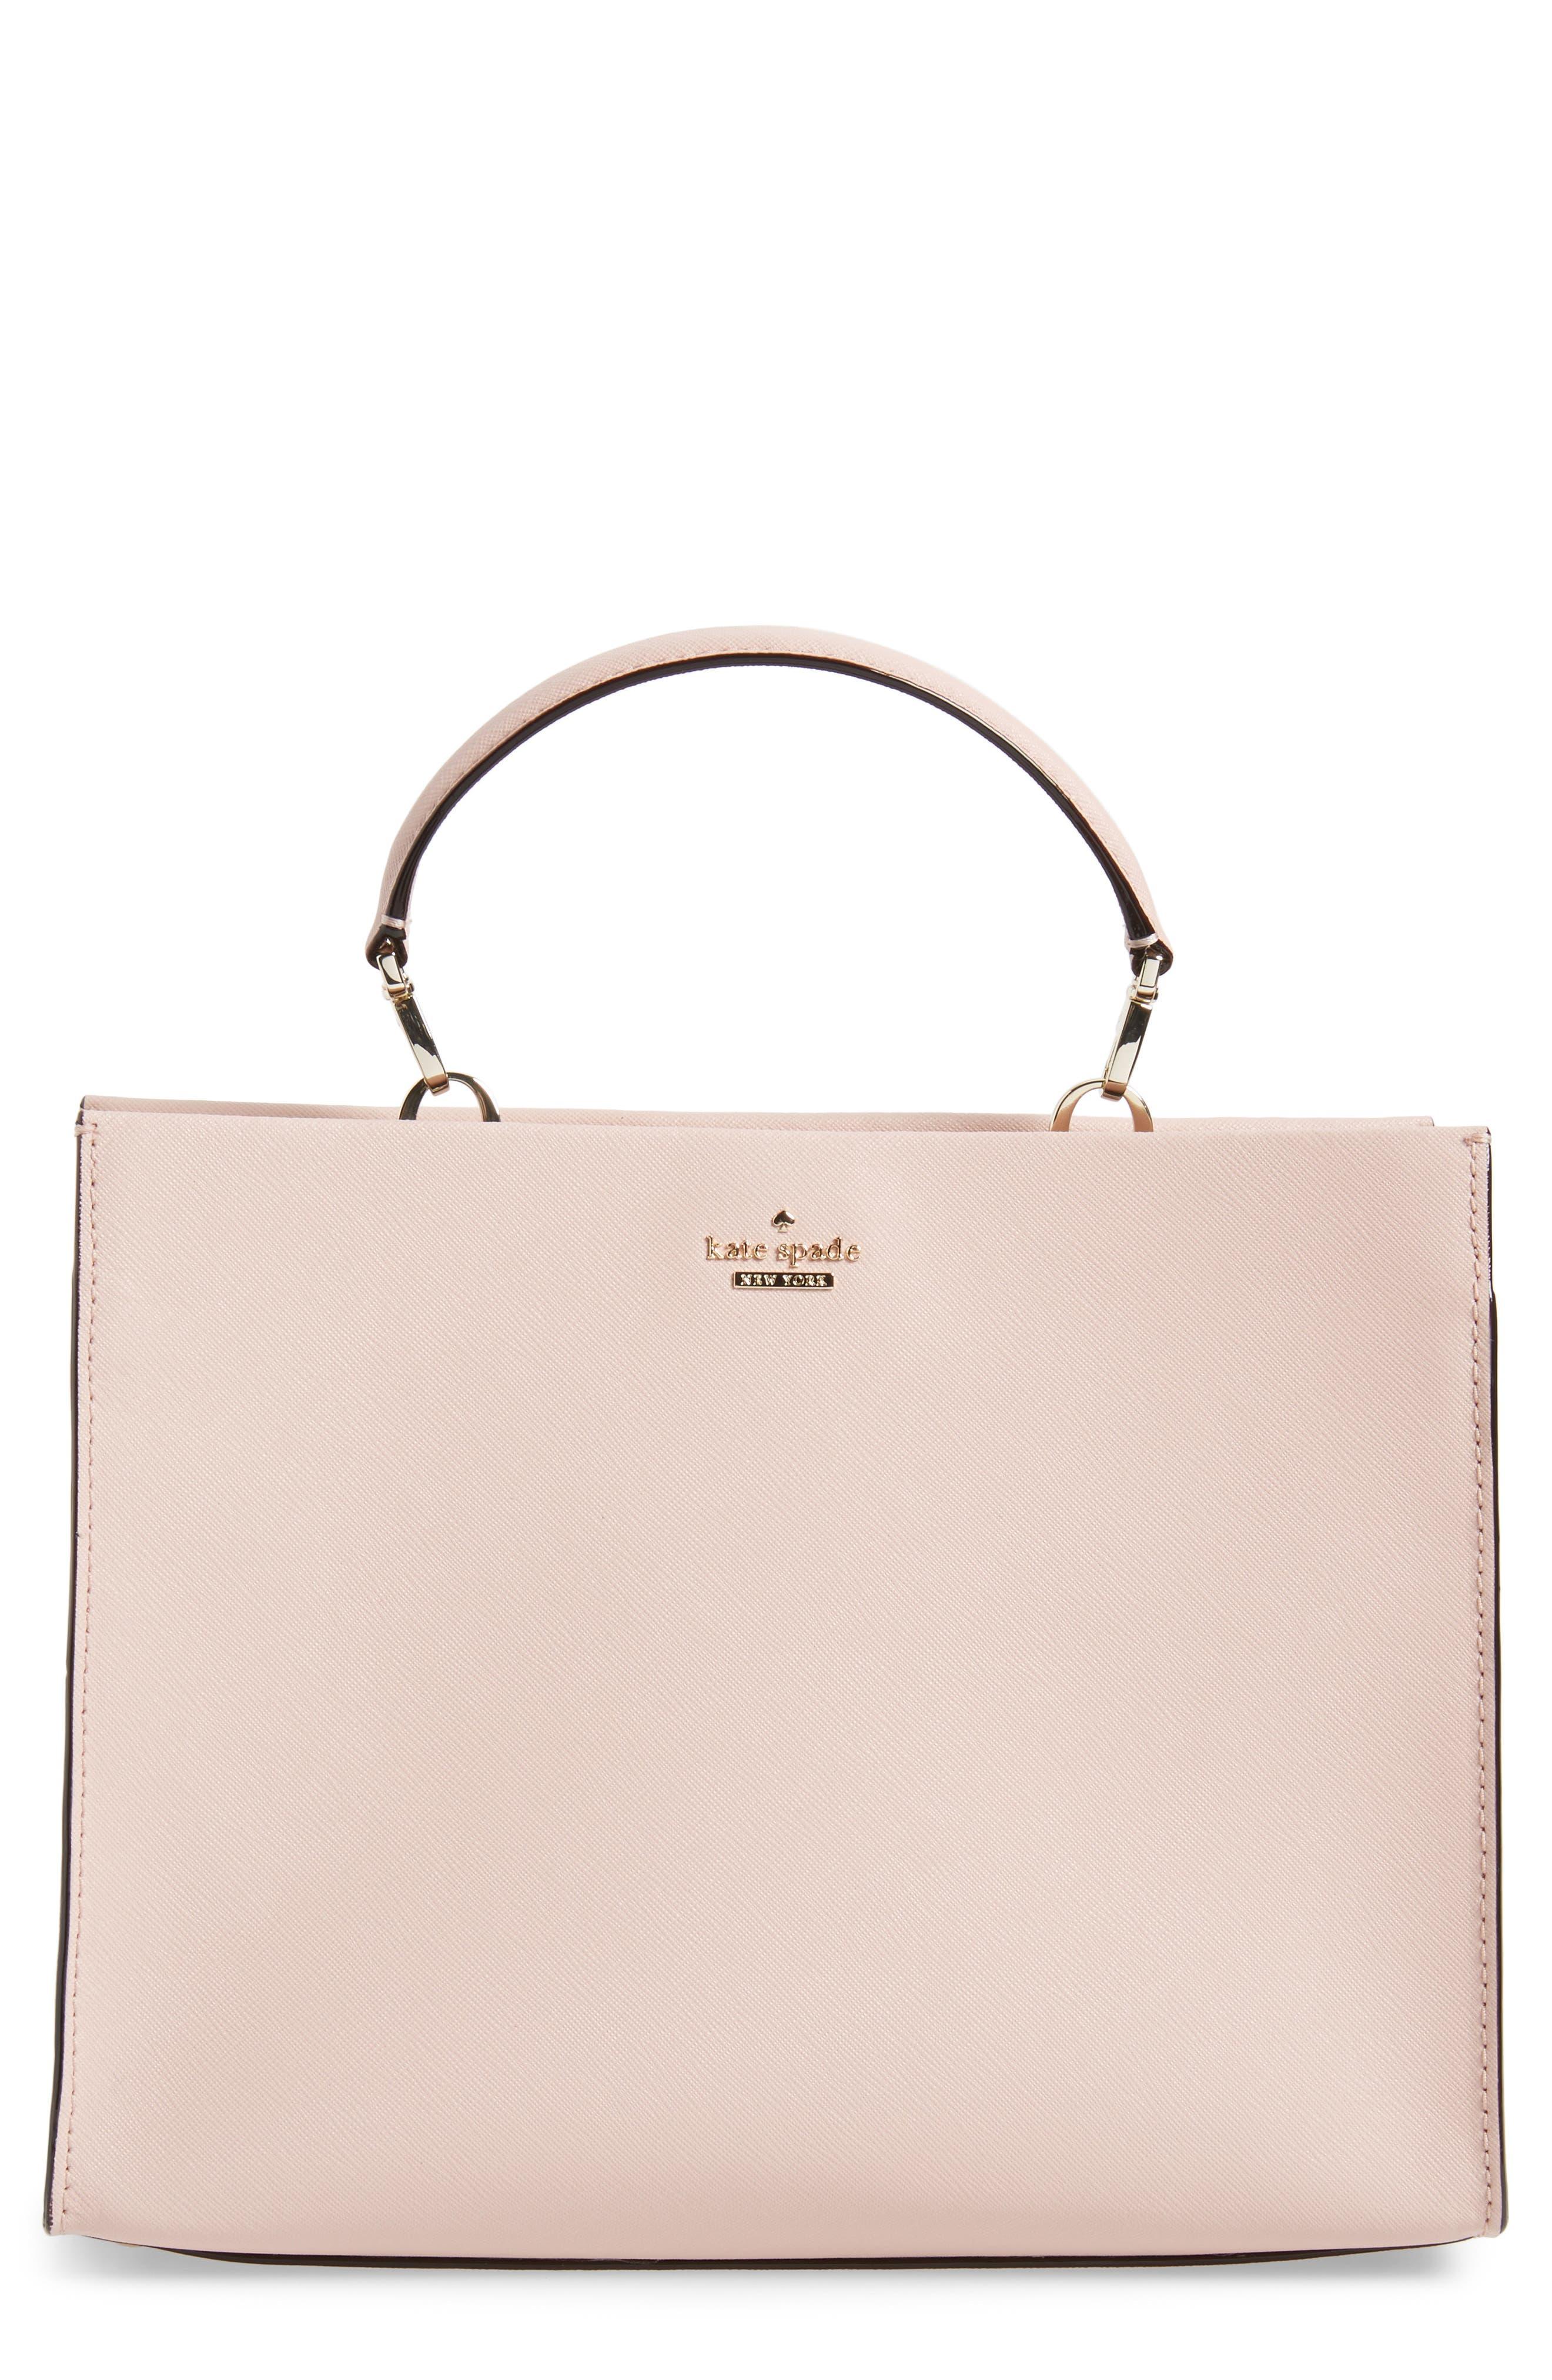 cameron street - sara leather satchel,                         Main,                         color, Warm Vellum